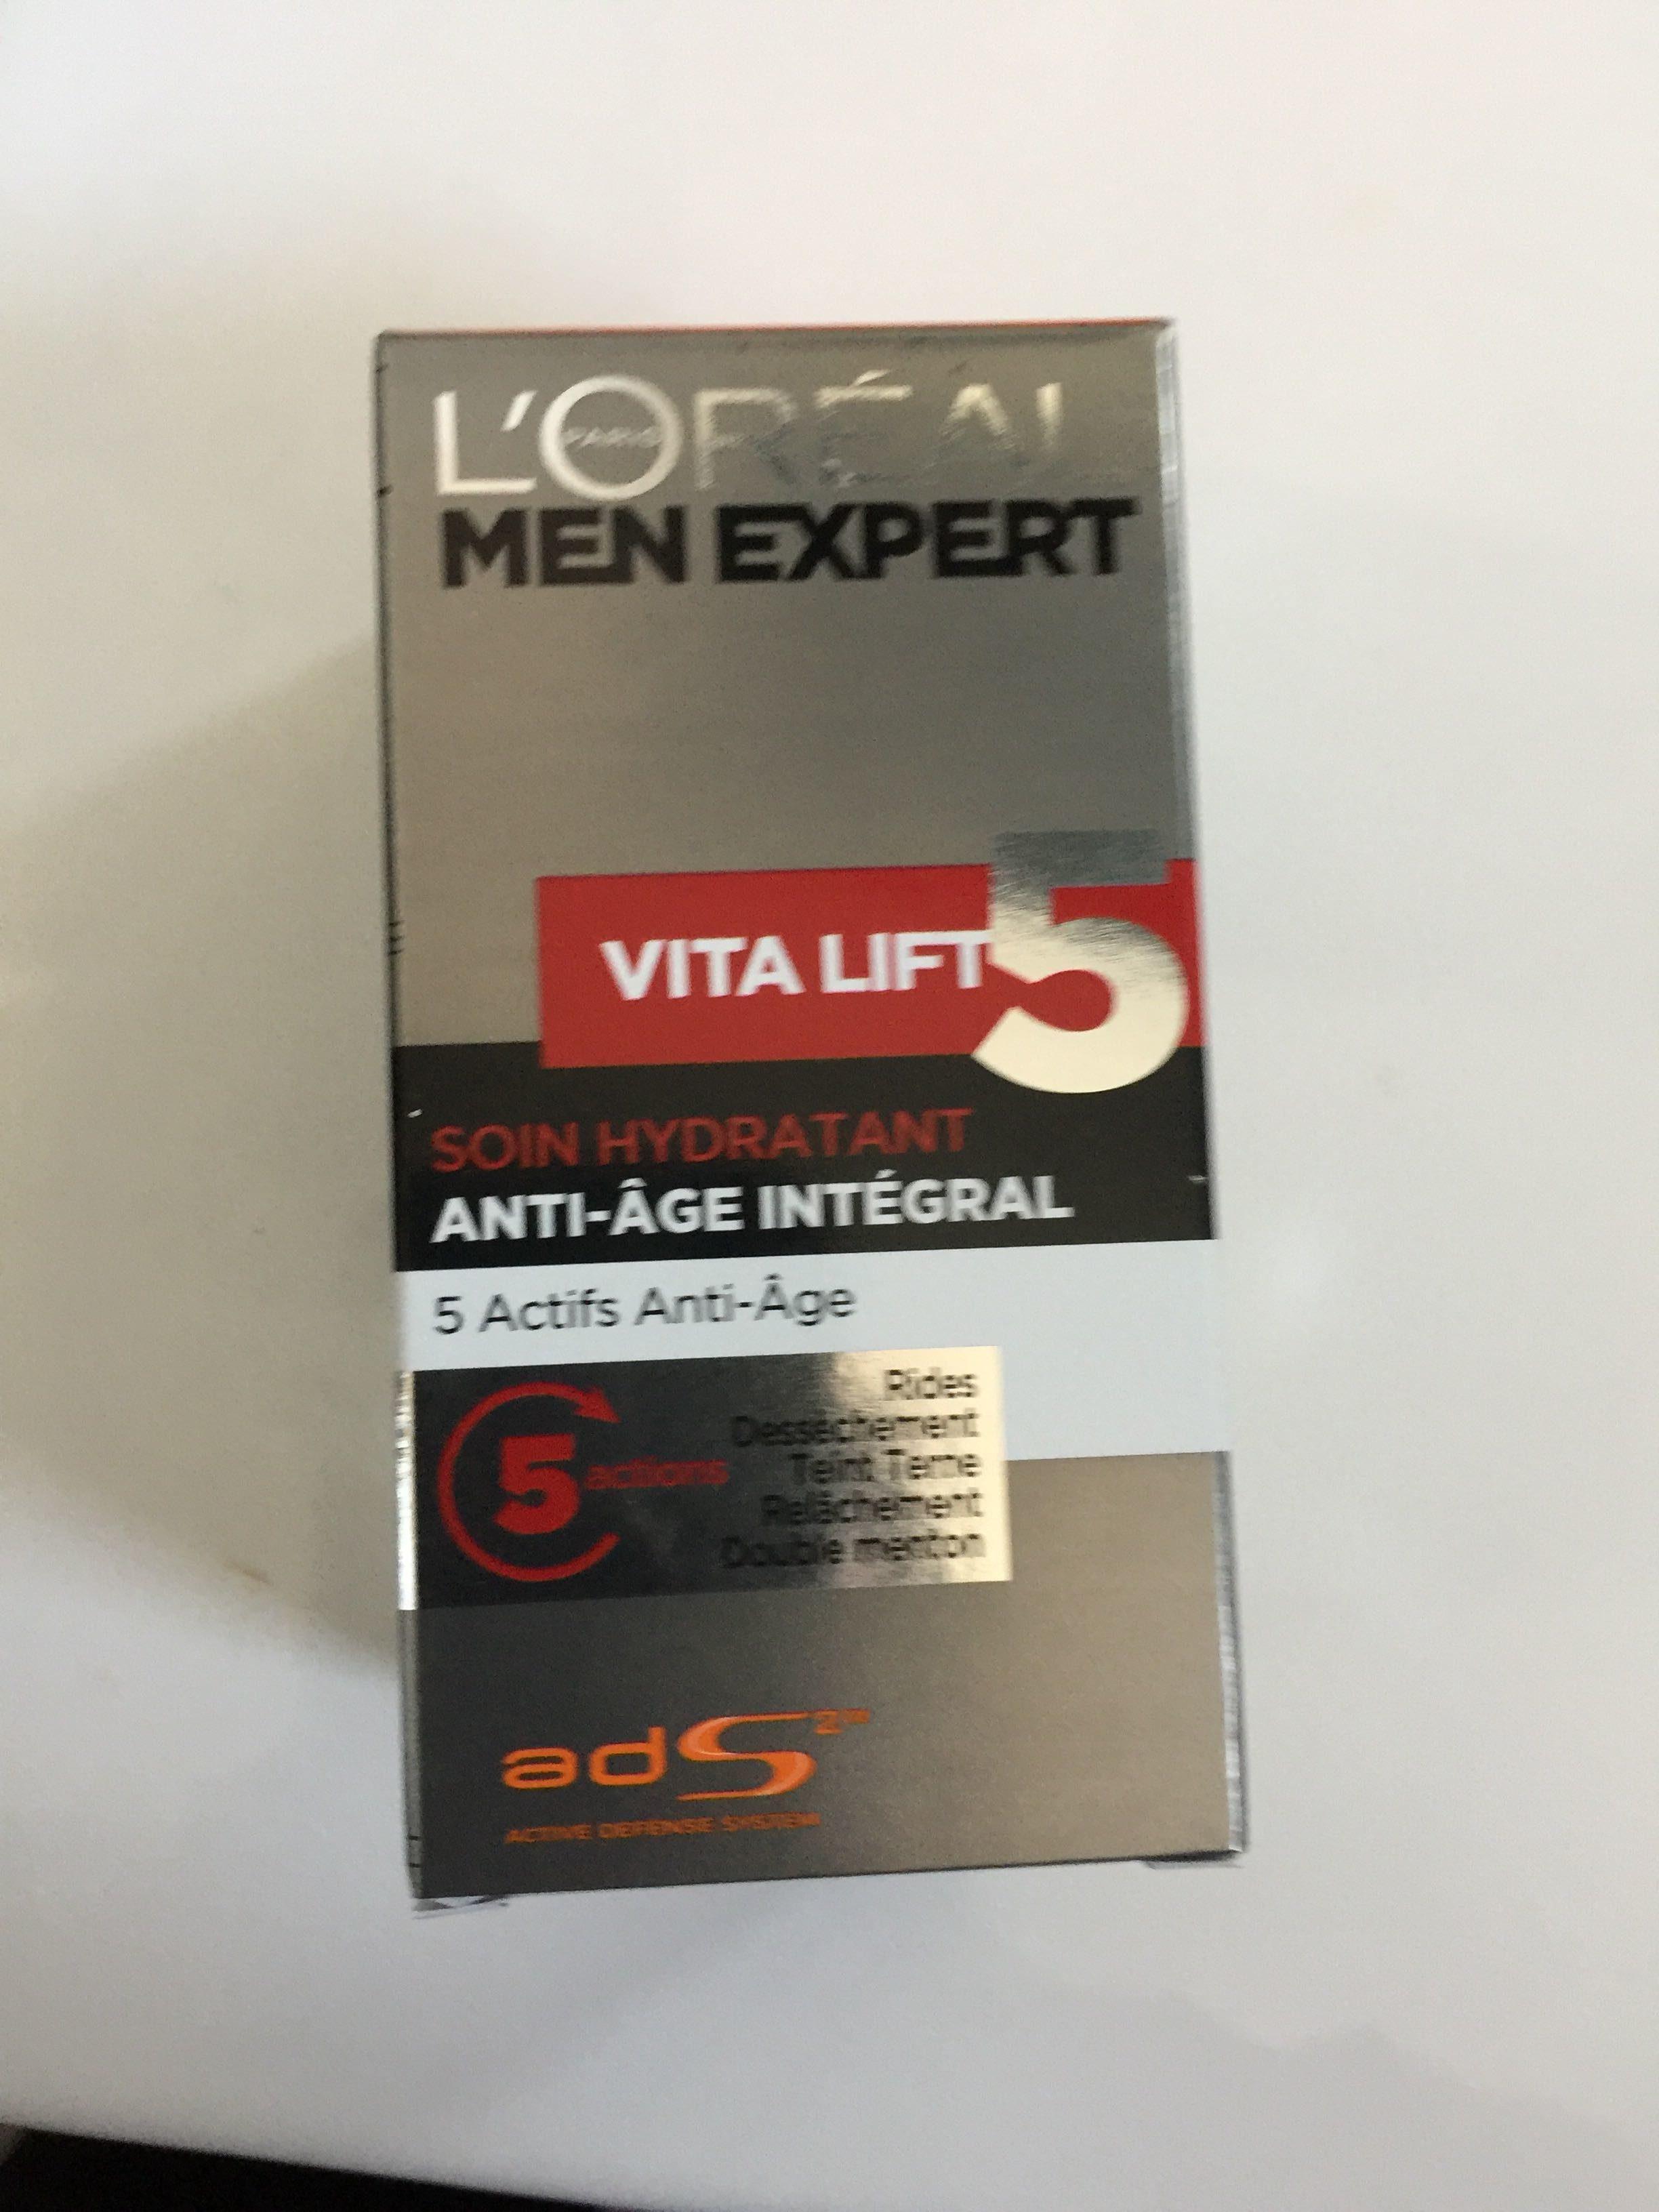 Vita Lift 5 - Product